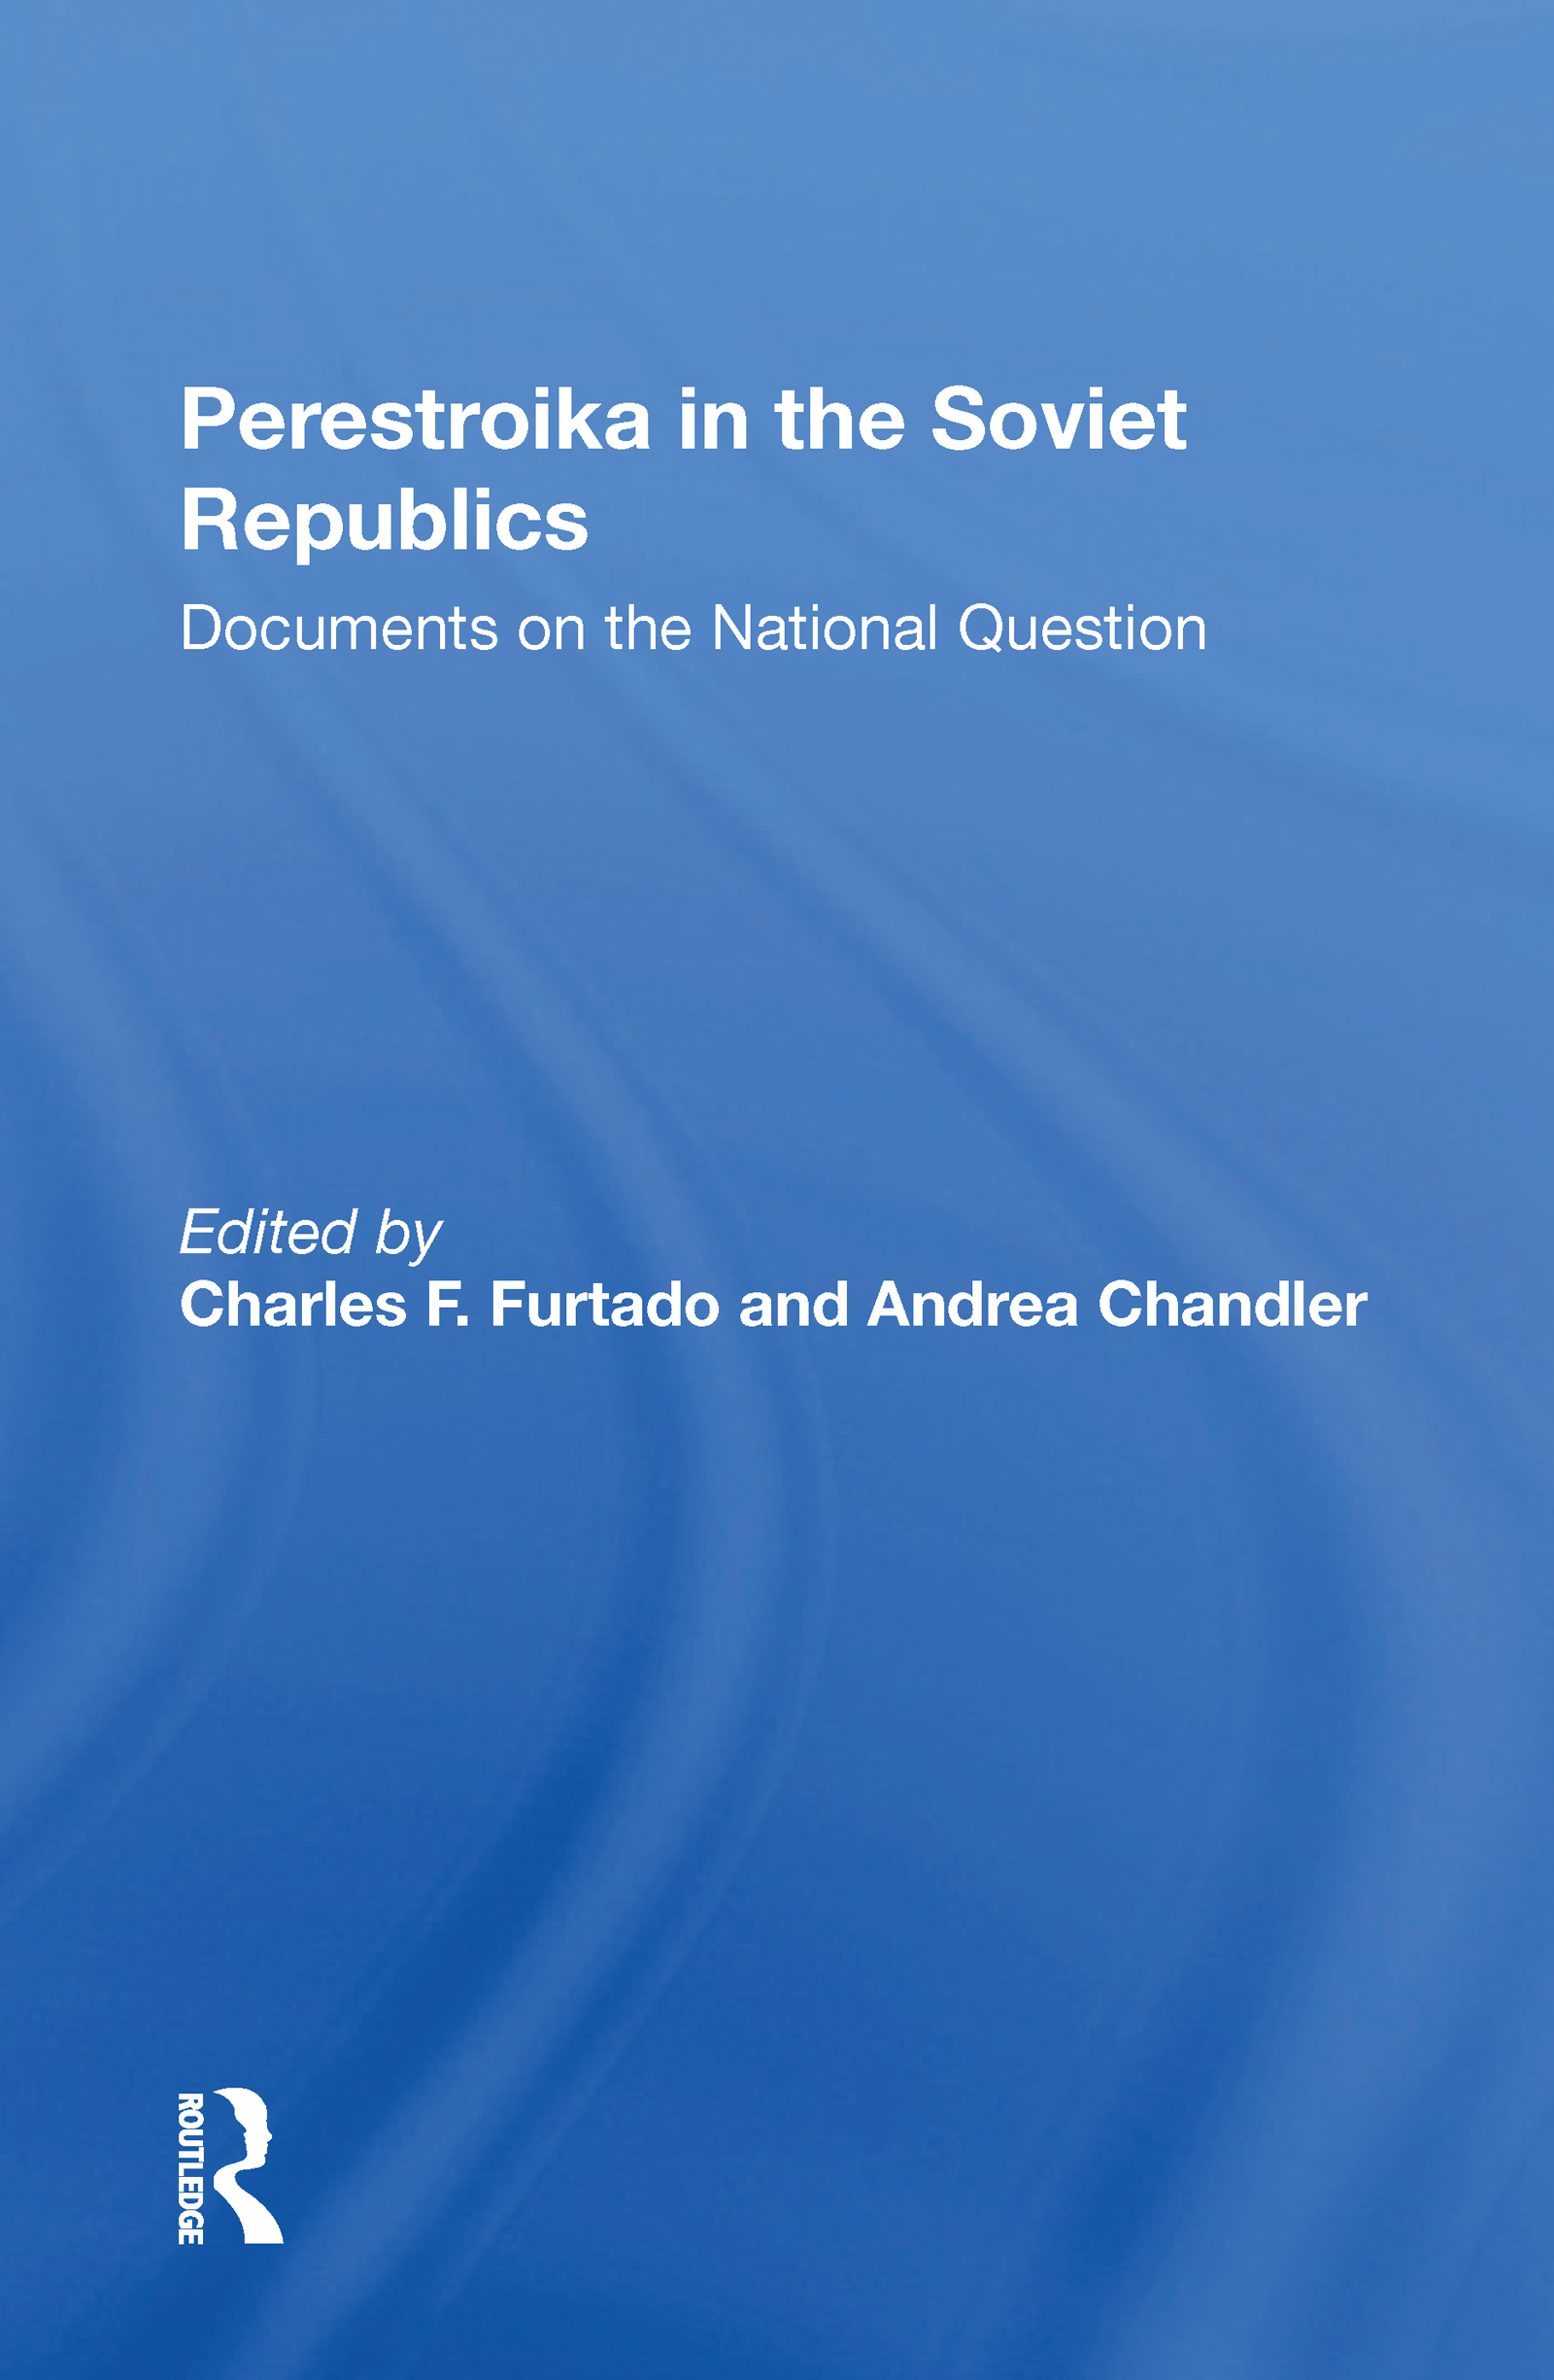 Perestroika In The Soviet Republics